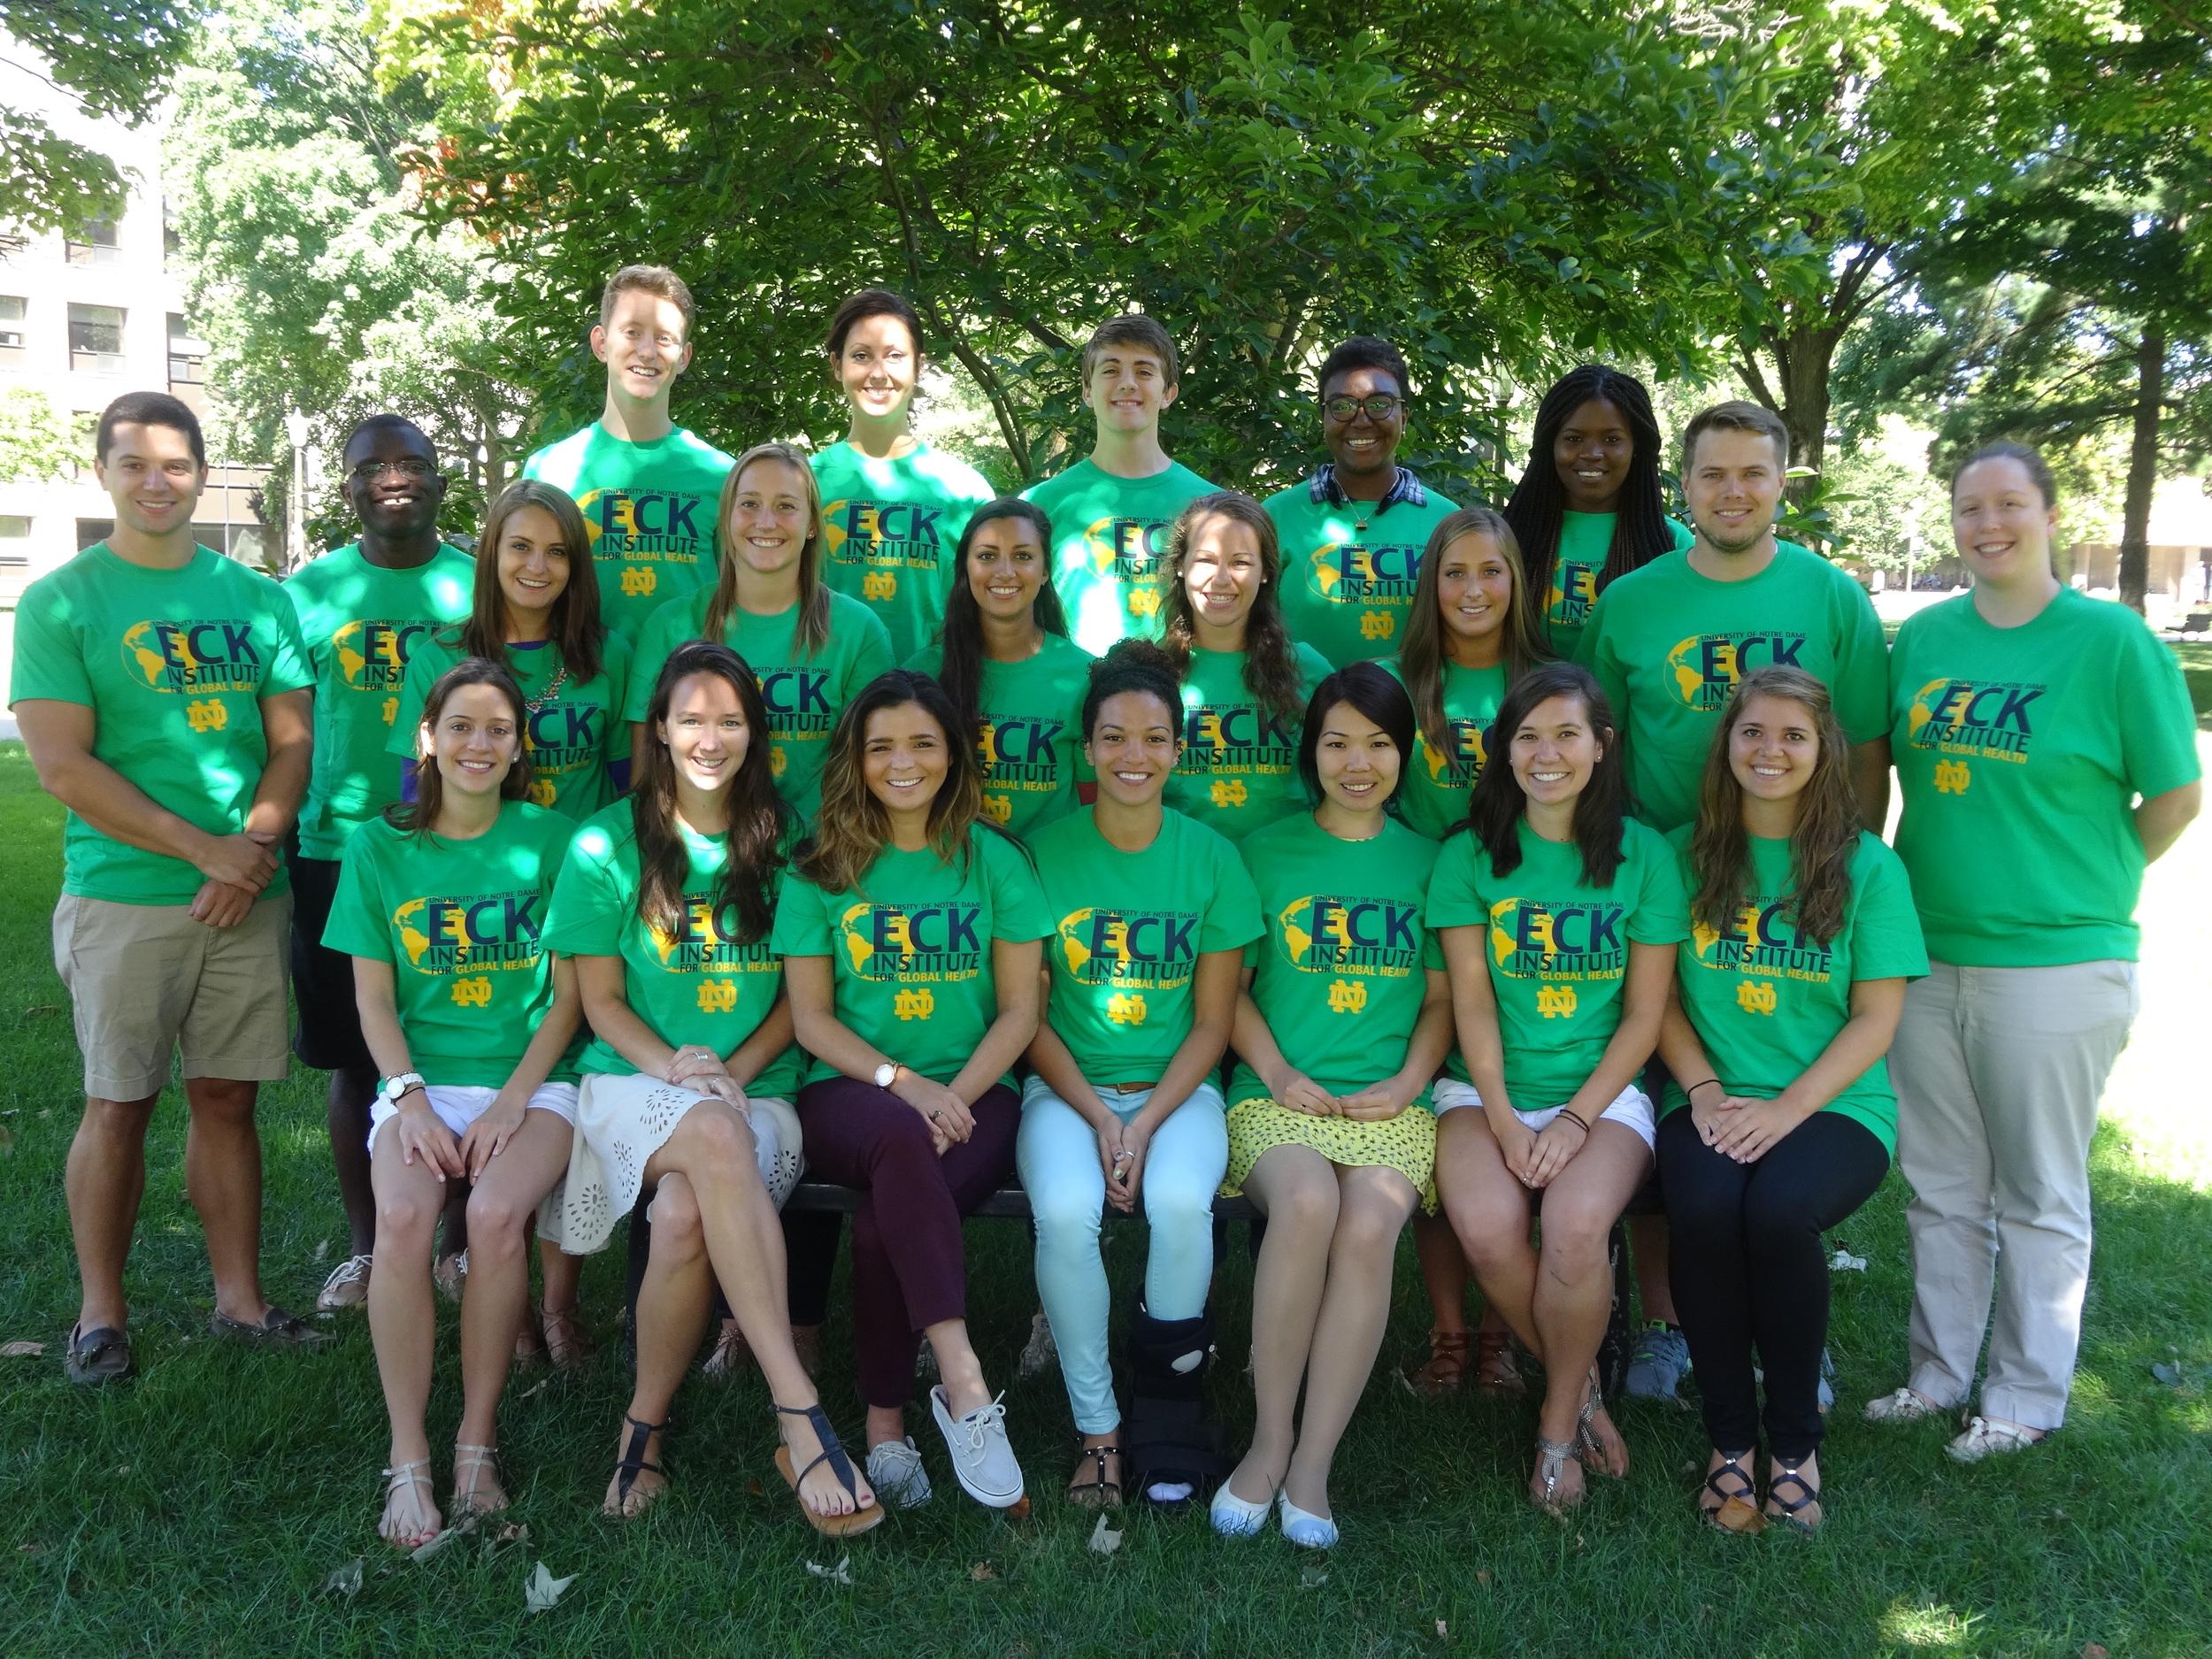 Class of 2016 group photo fall 2015.jpg